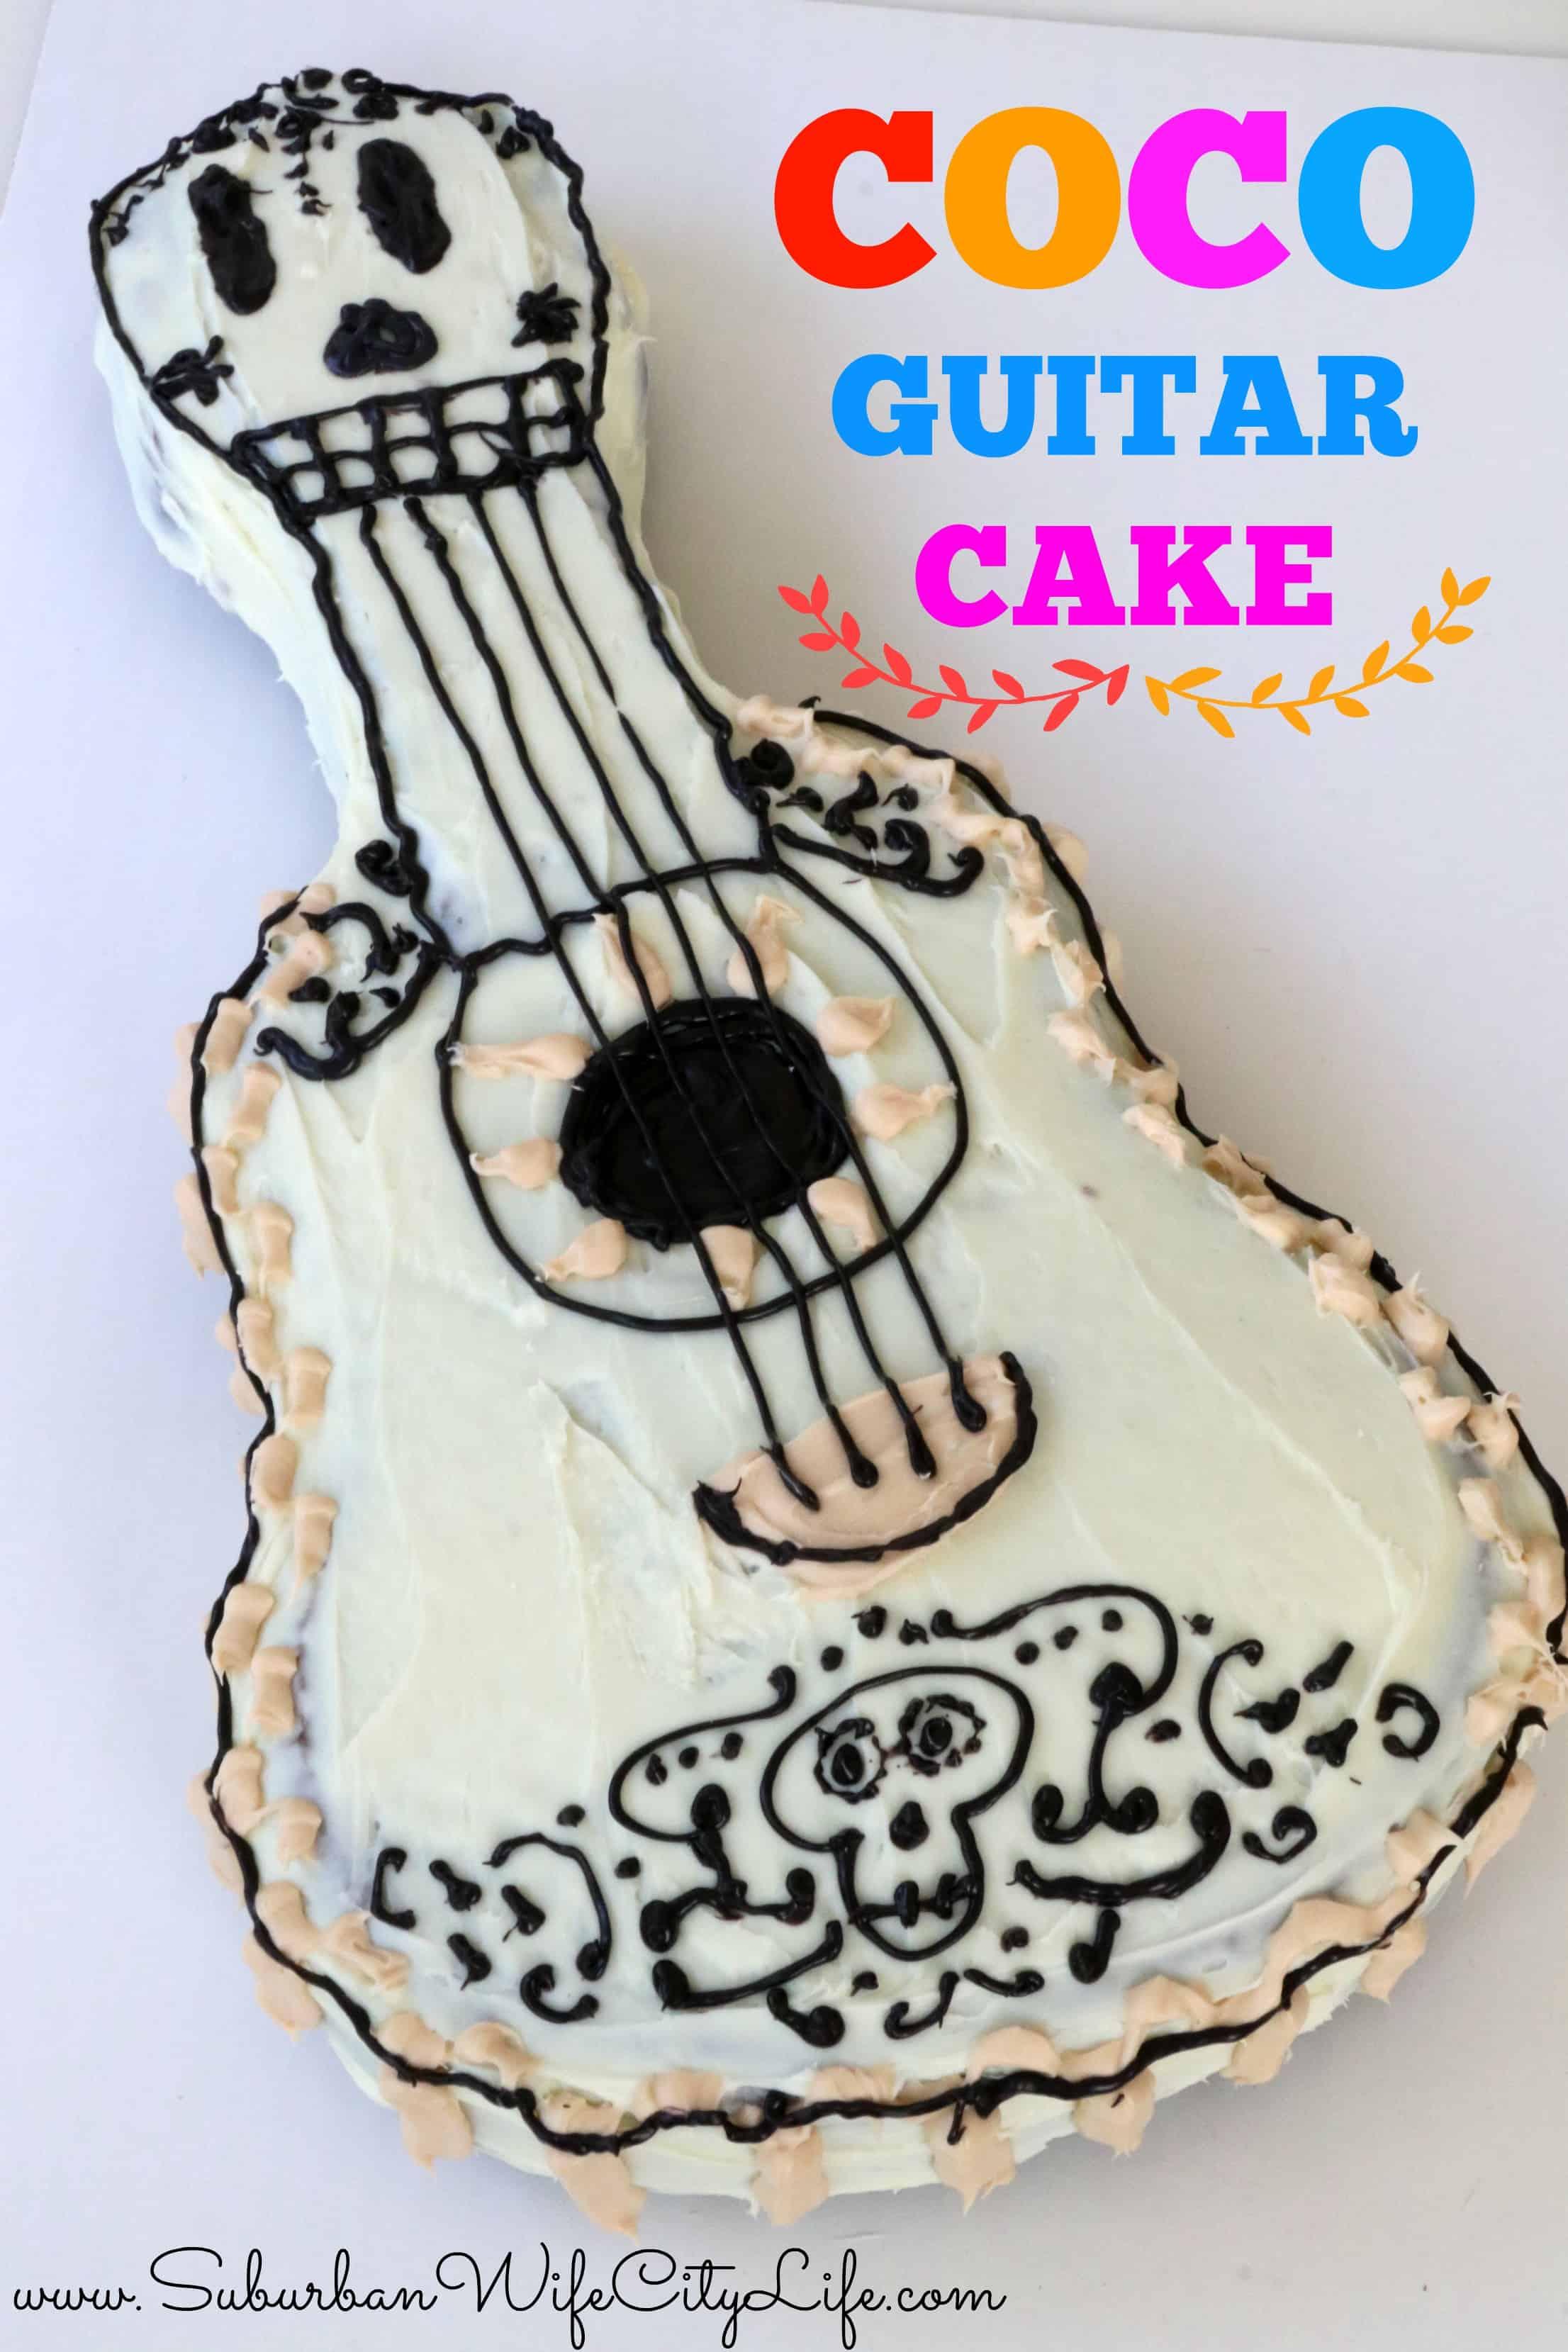 Disney Pixar Coco Guitar Cake